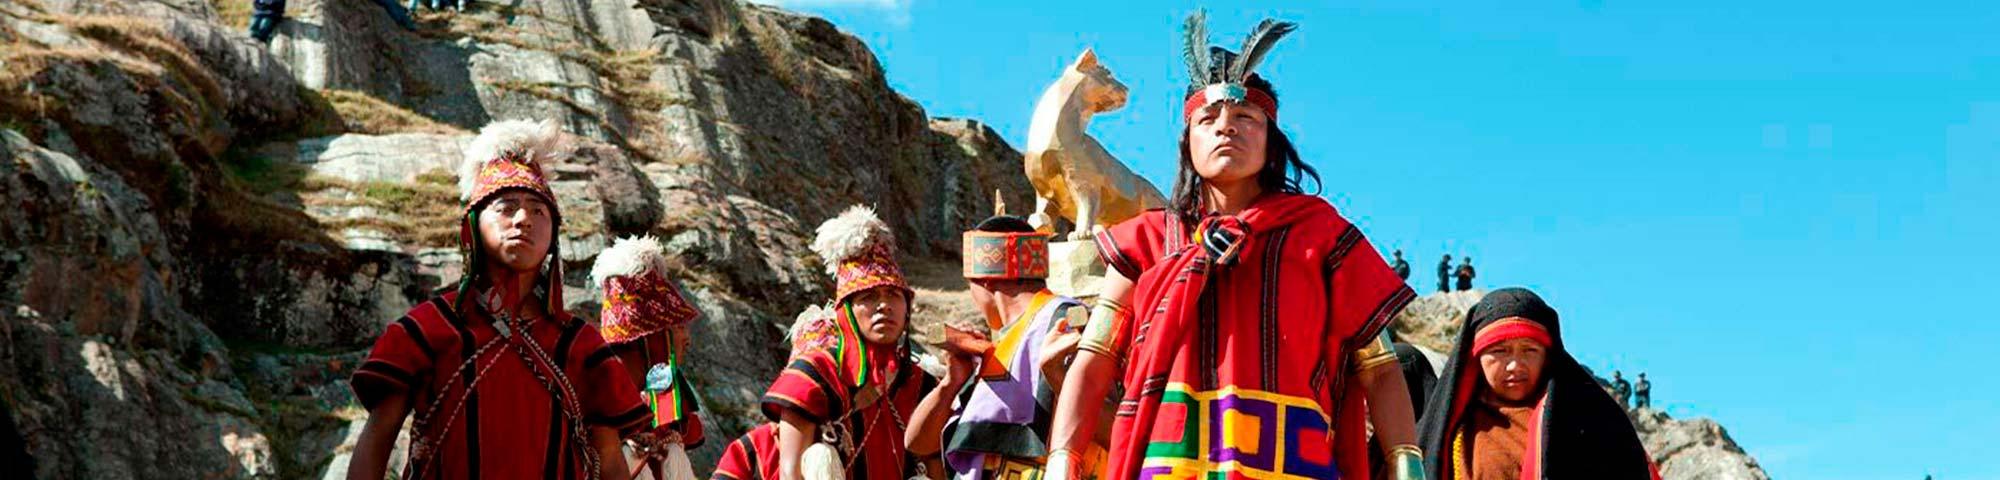 Inti Raymi del Bicentenario será transmitido en todo Latinoamérica